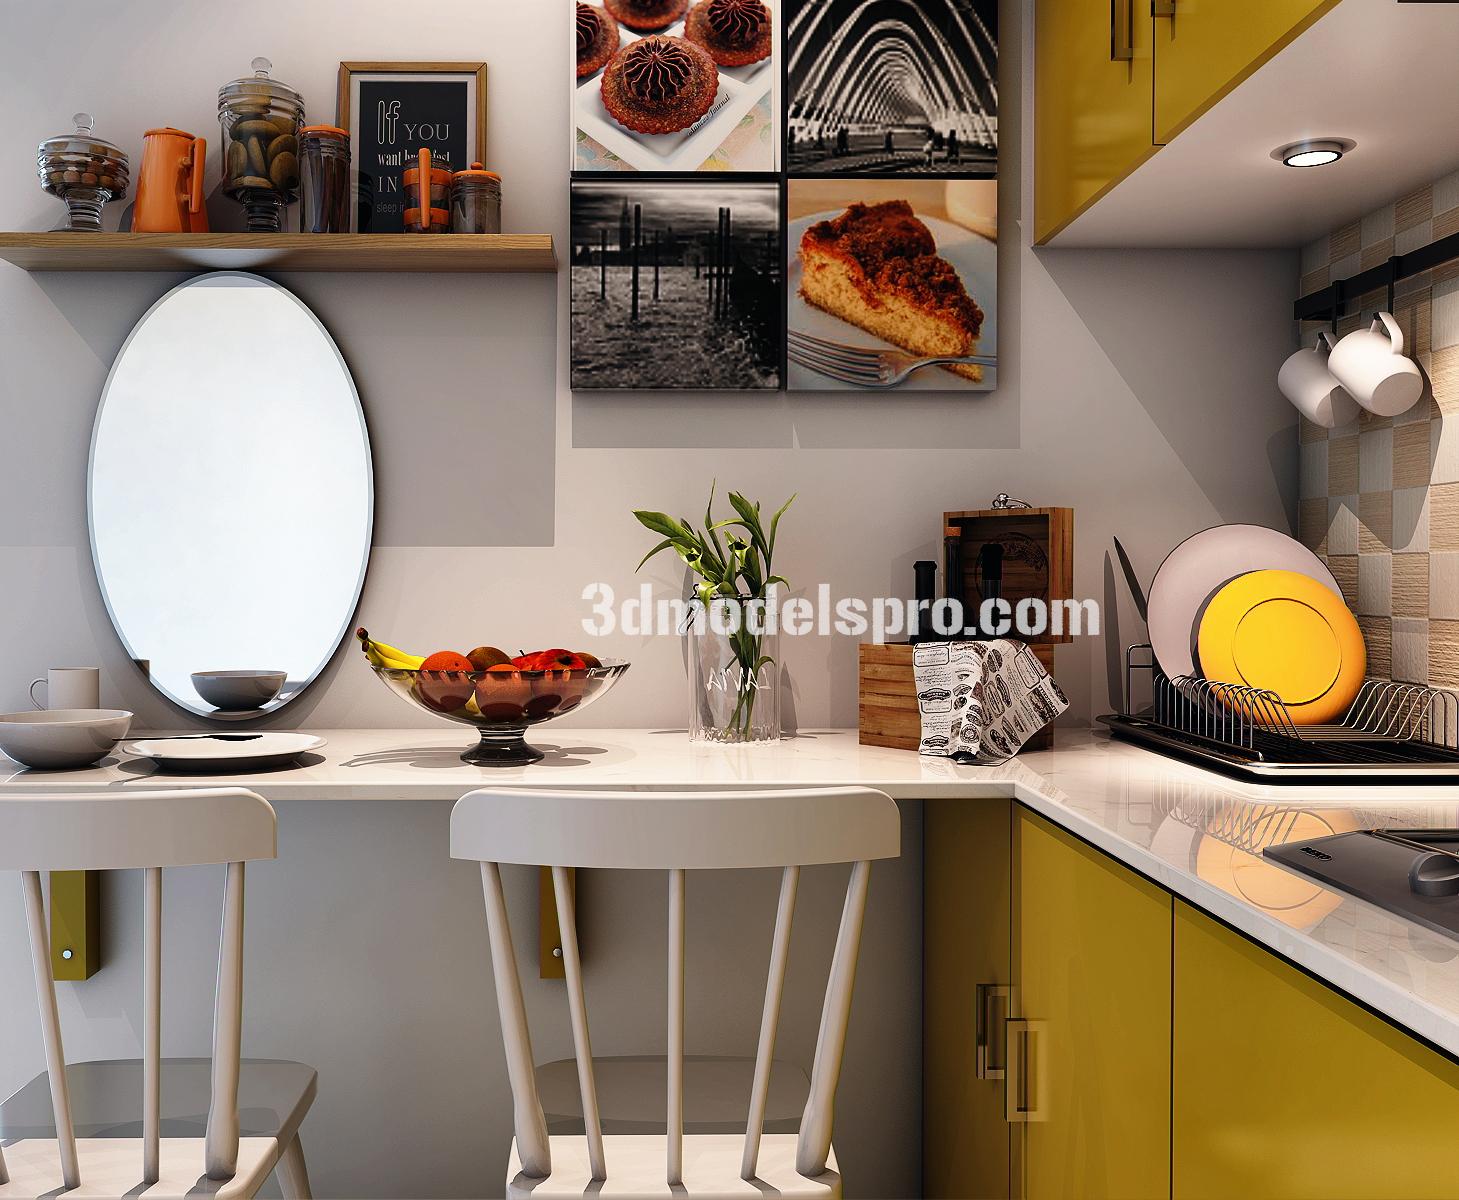 sketchup scene very small kitchen free stuffs for sketchup vray sketchup scene very small kitchen